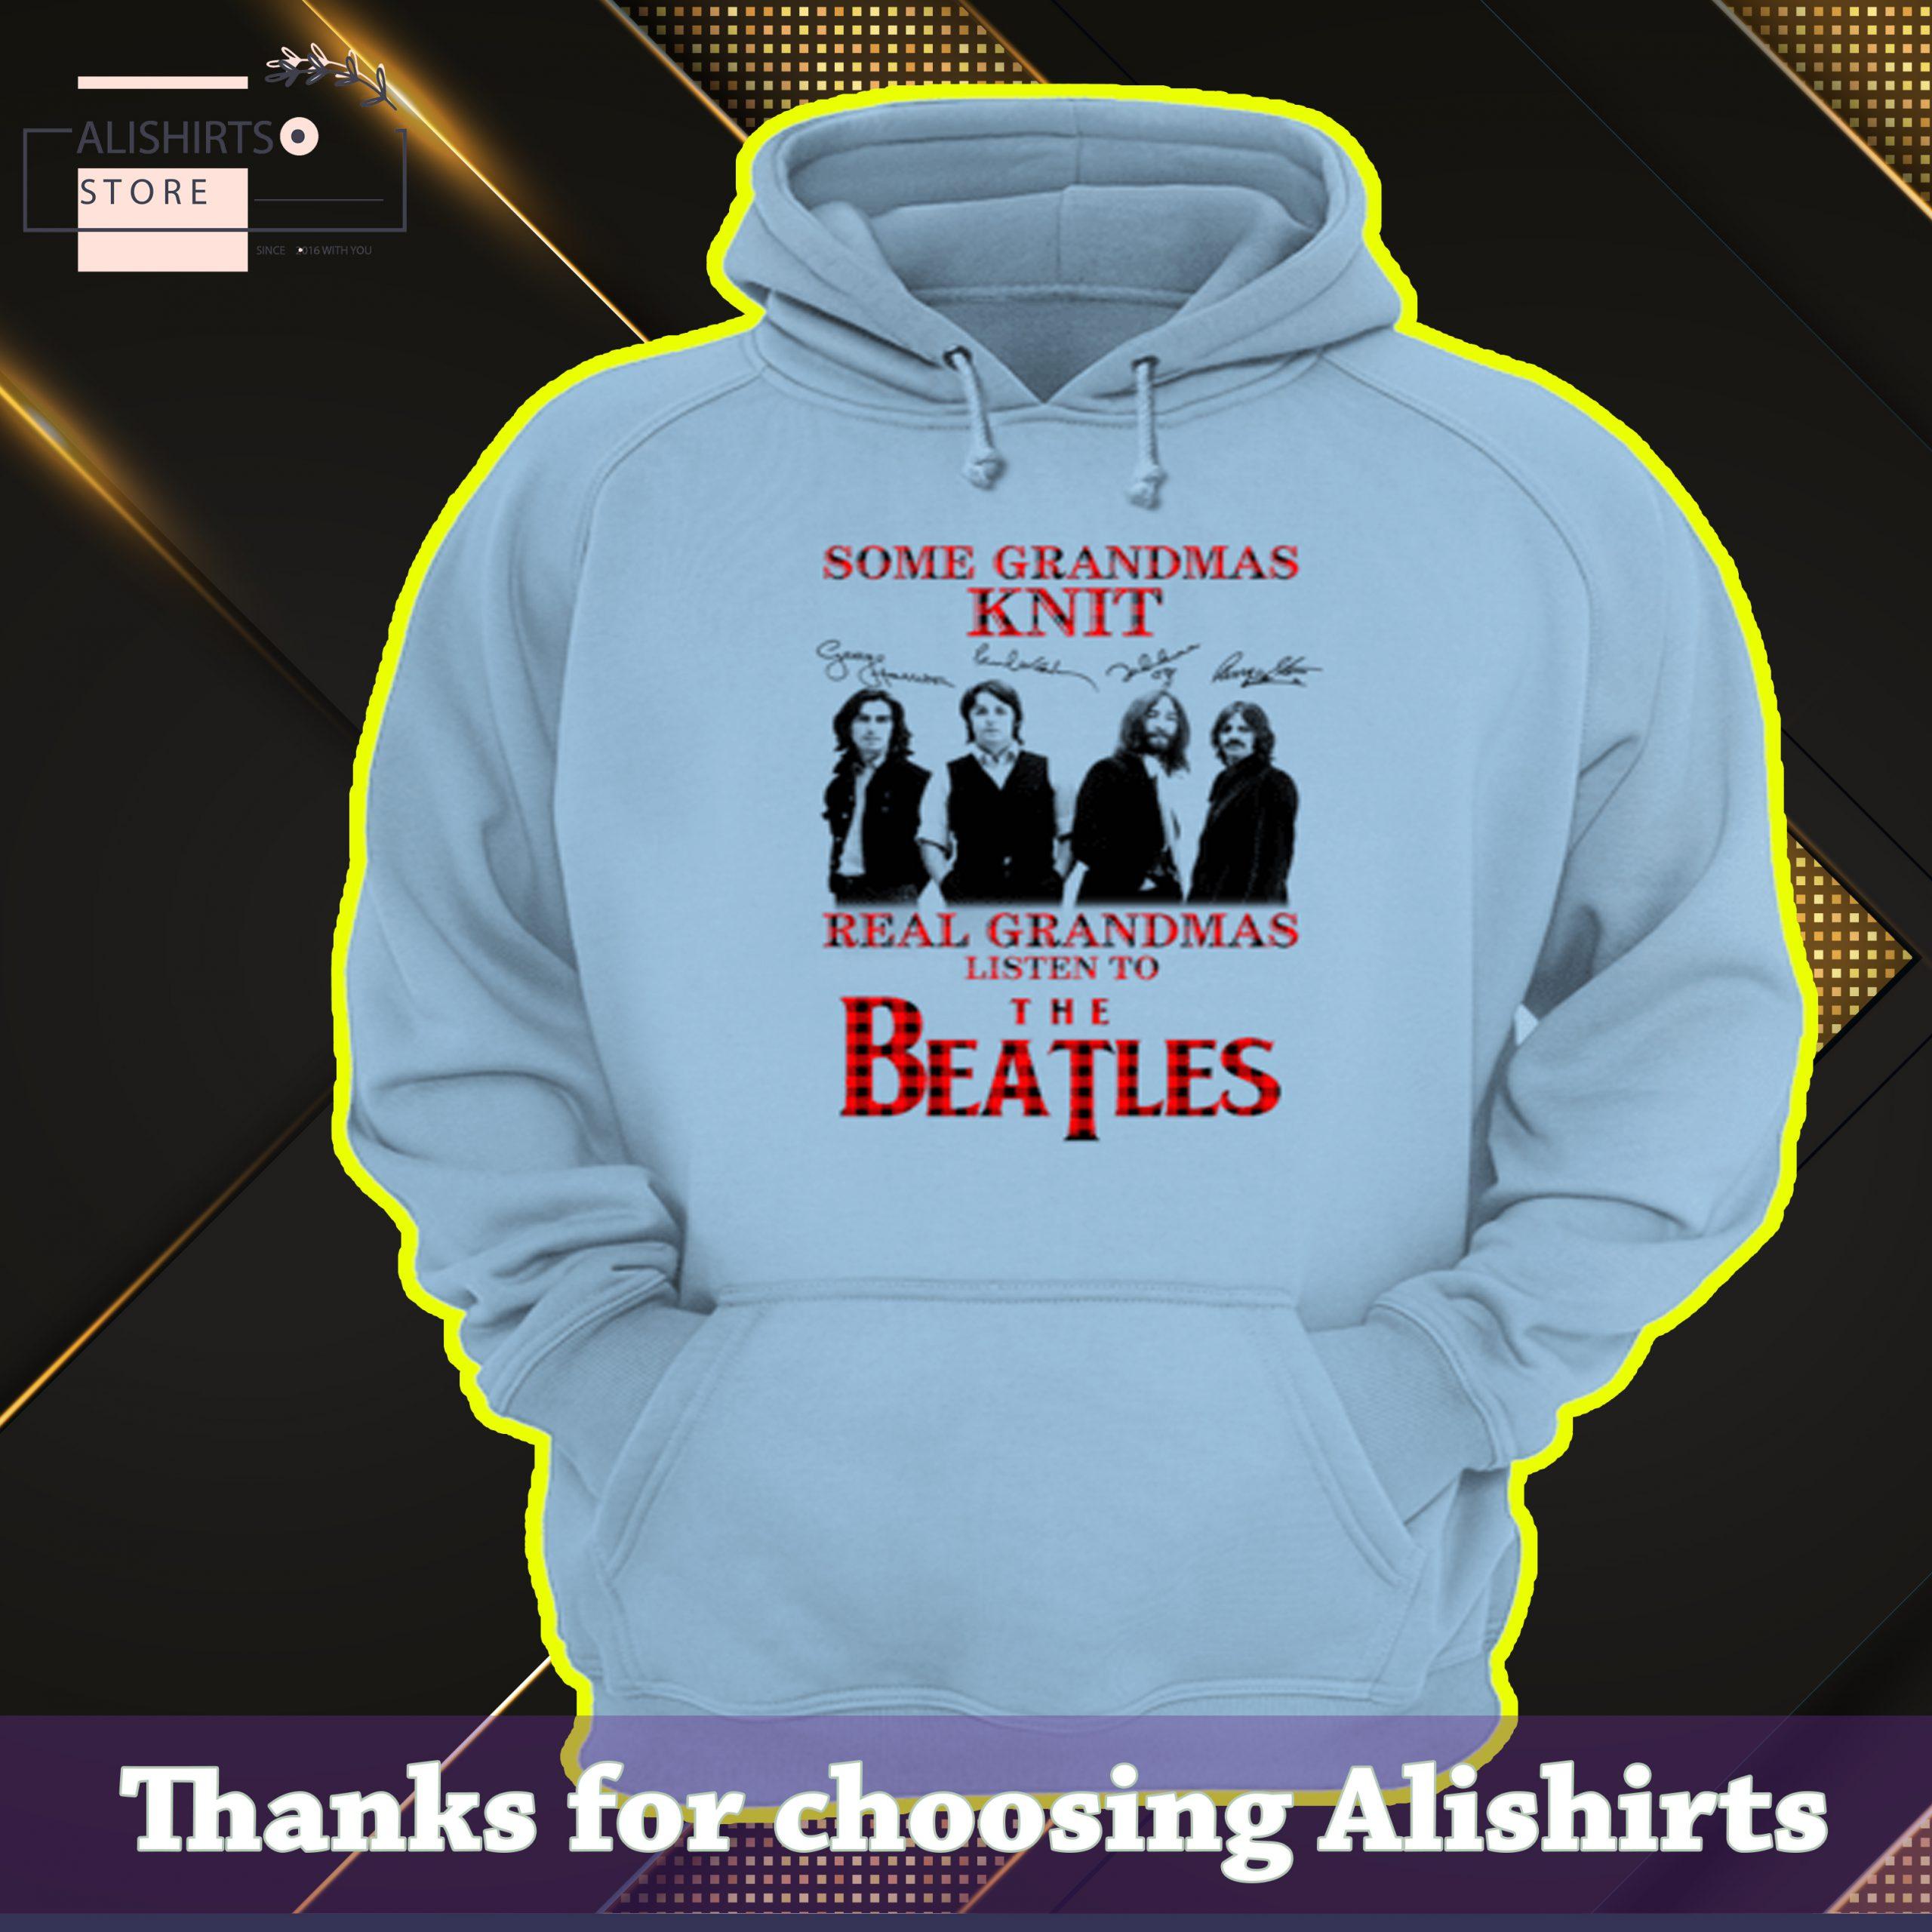 Some grandmas knit real grandmas listen to The Beatles signature Shirt, Hoodie, Tanktop